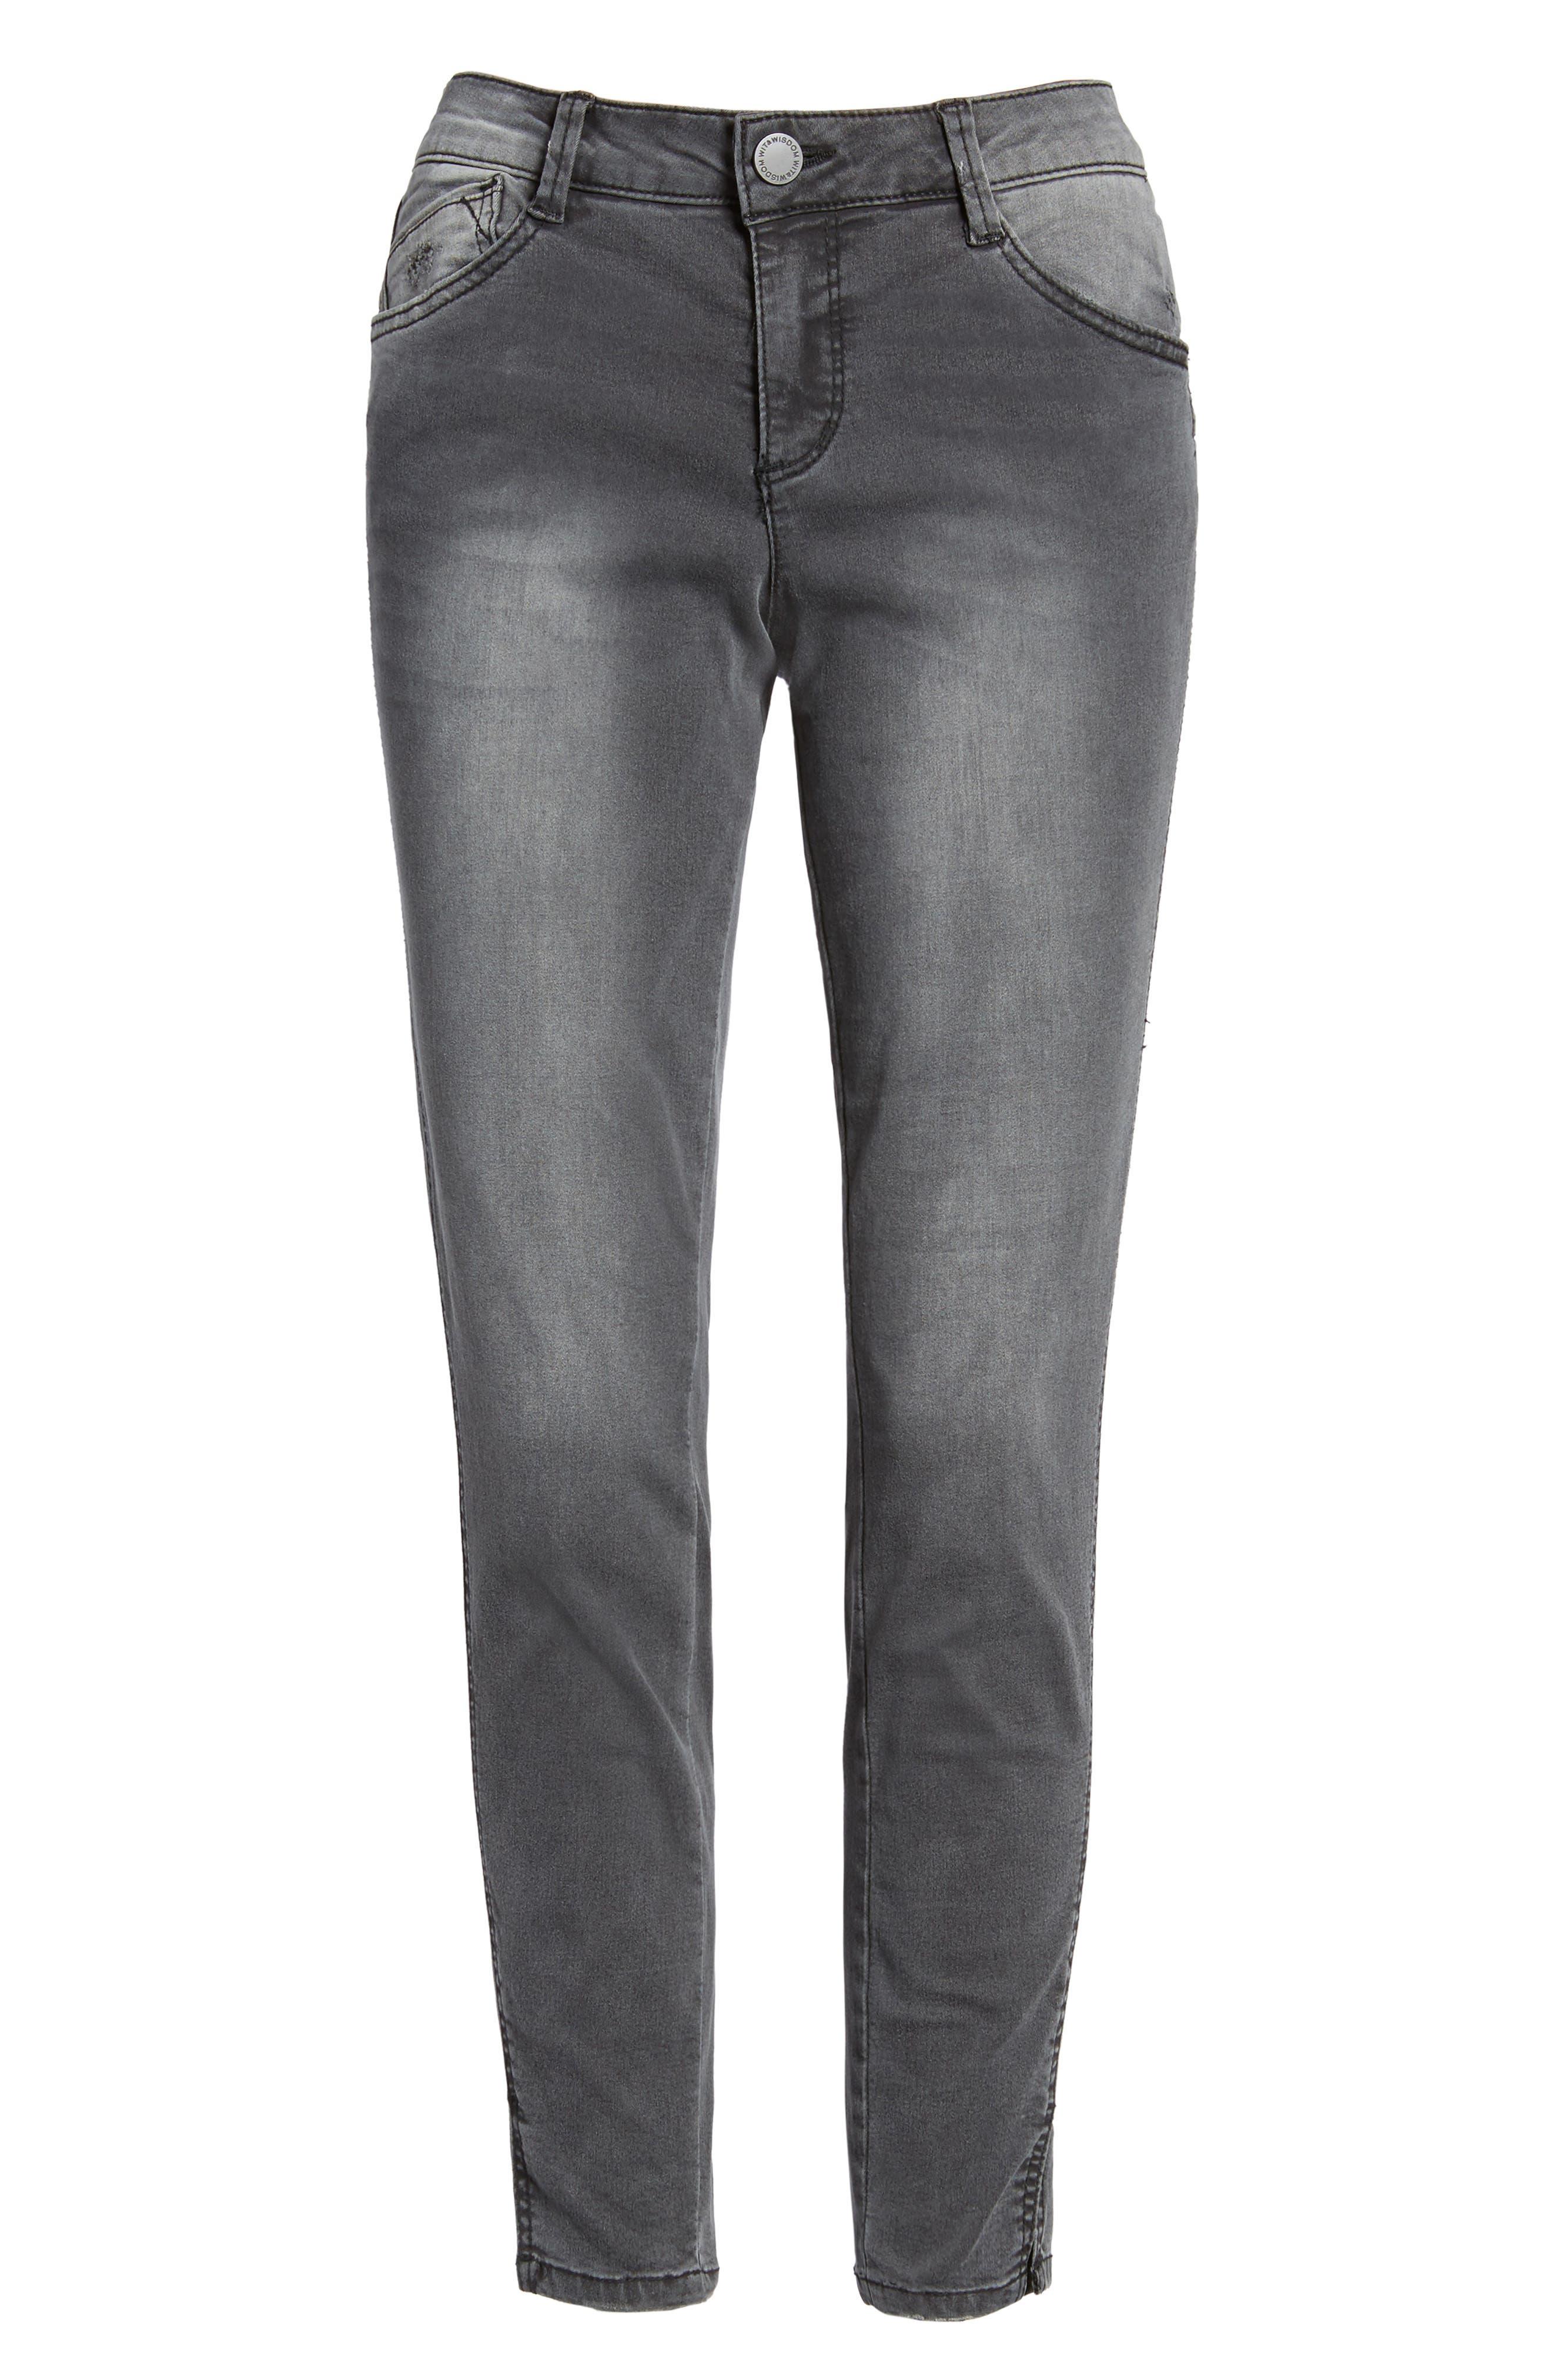 Slit Skinny Ankle Jeans,                             Alternate thumbnail 6, color,                             020